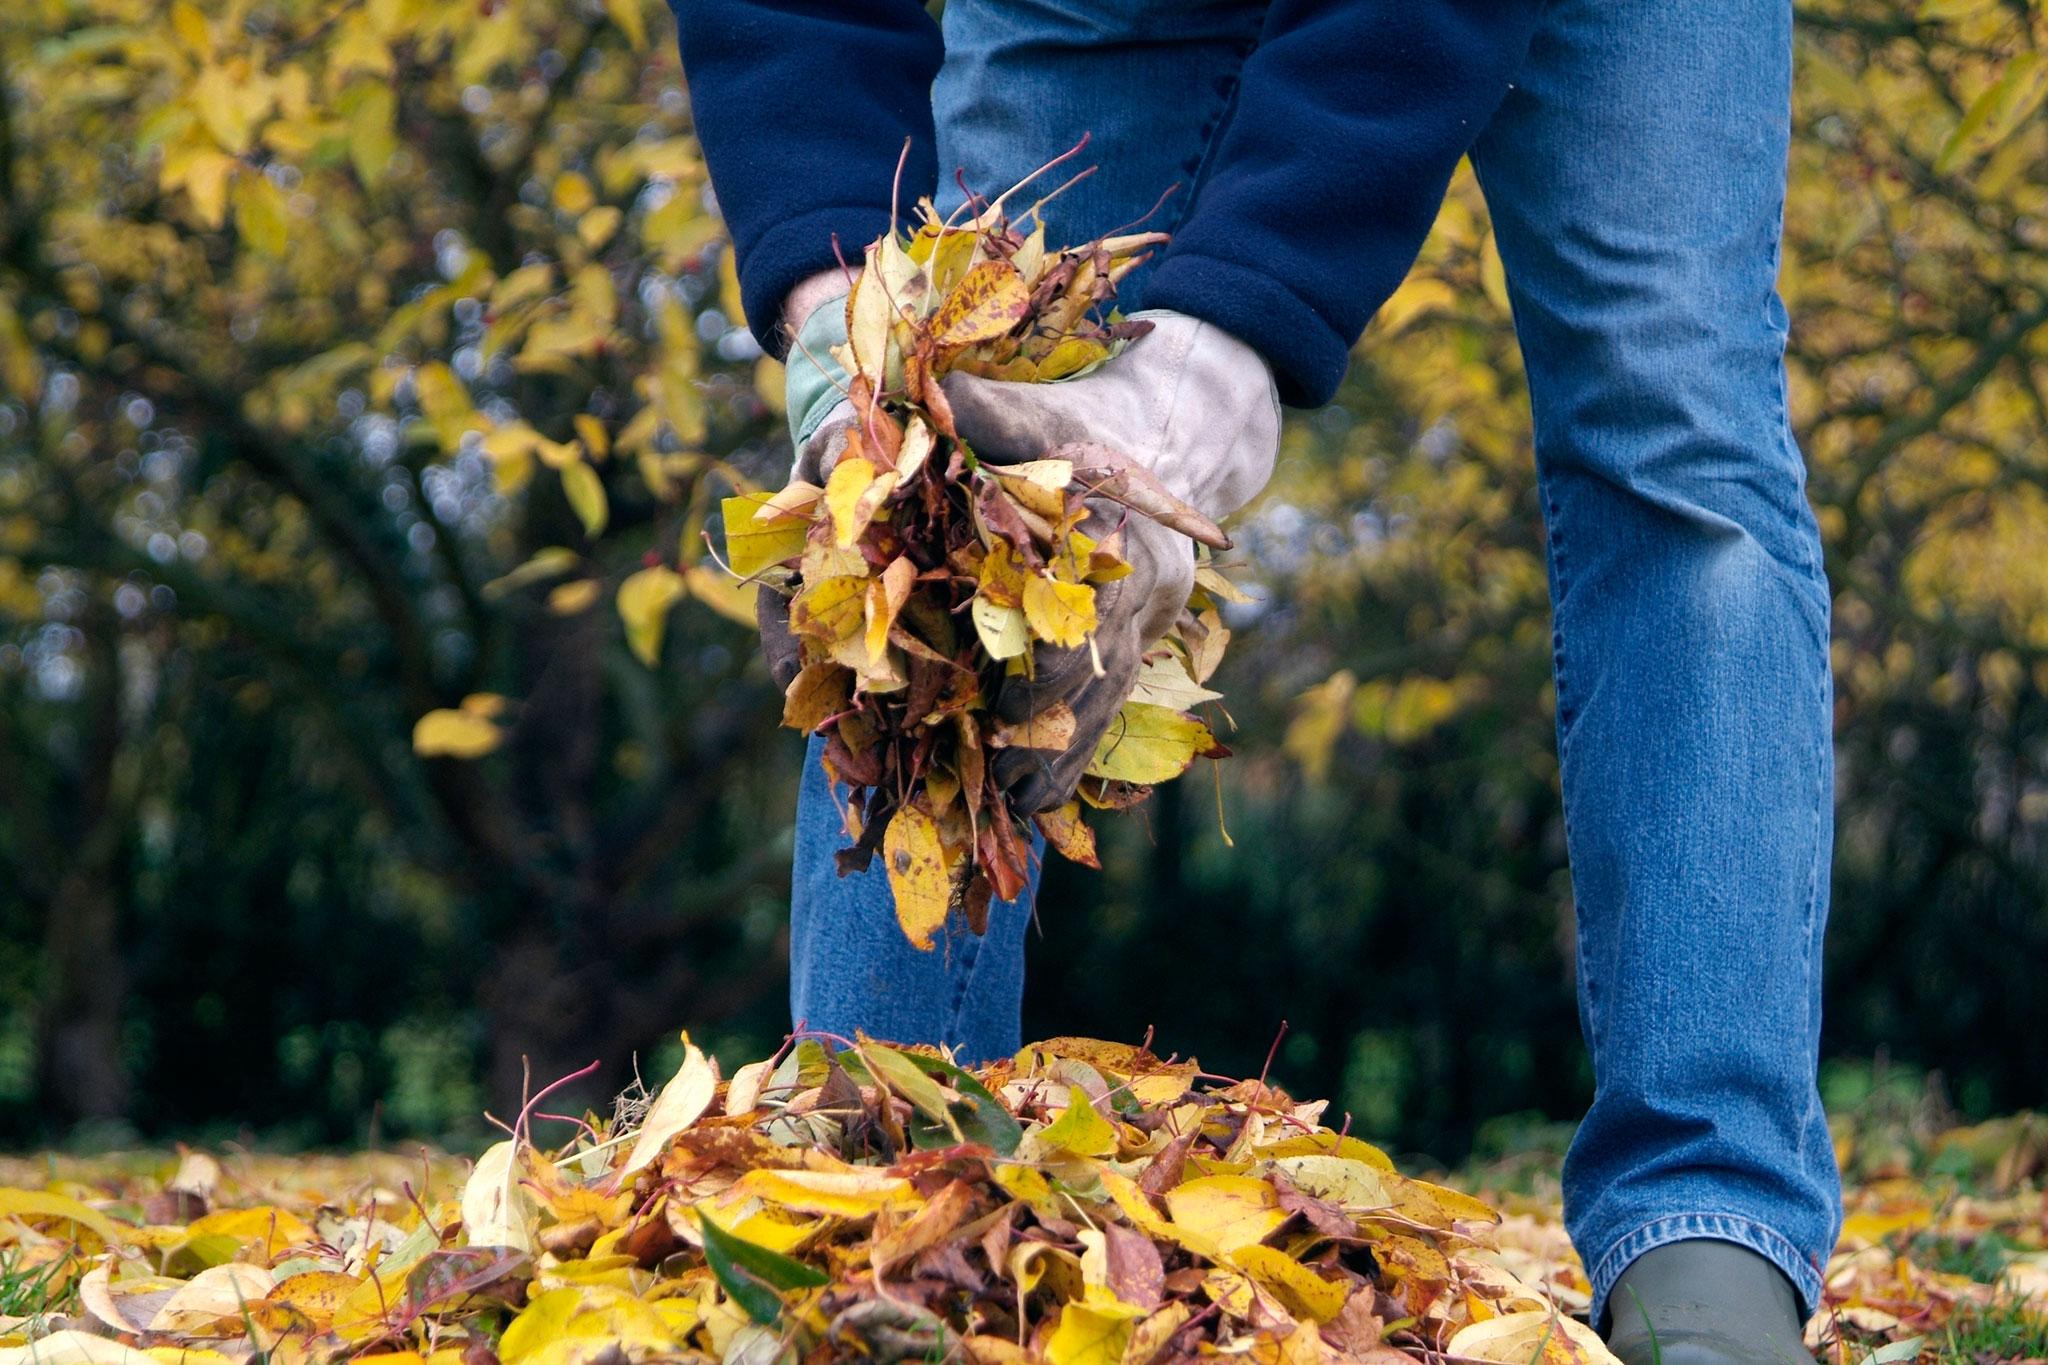 Gathering autumn leaves